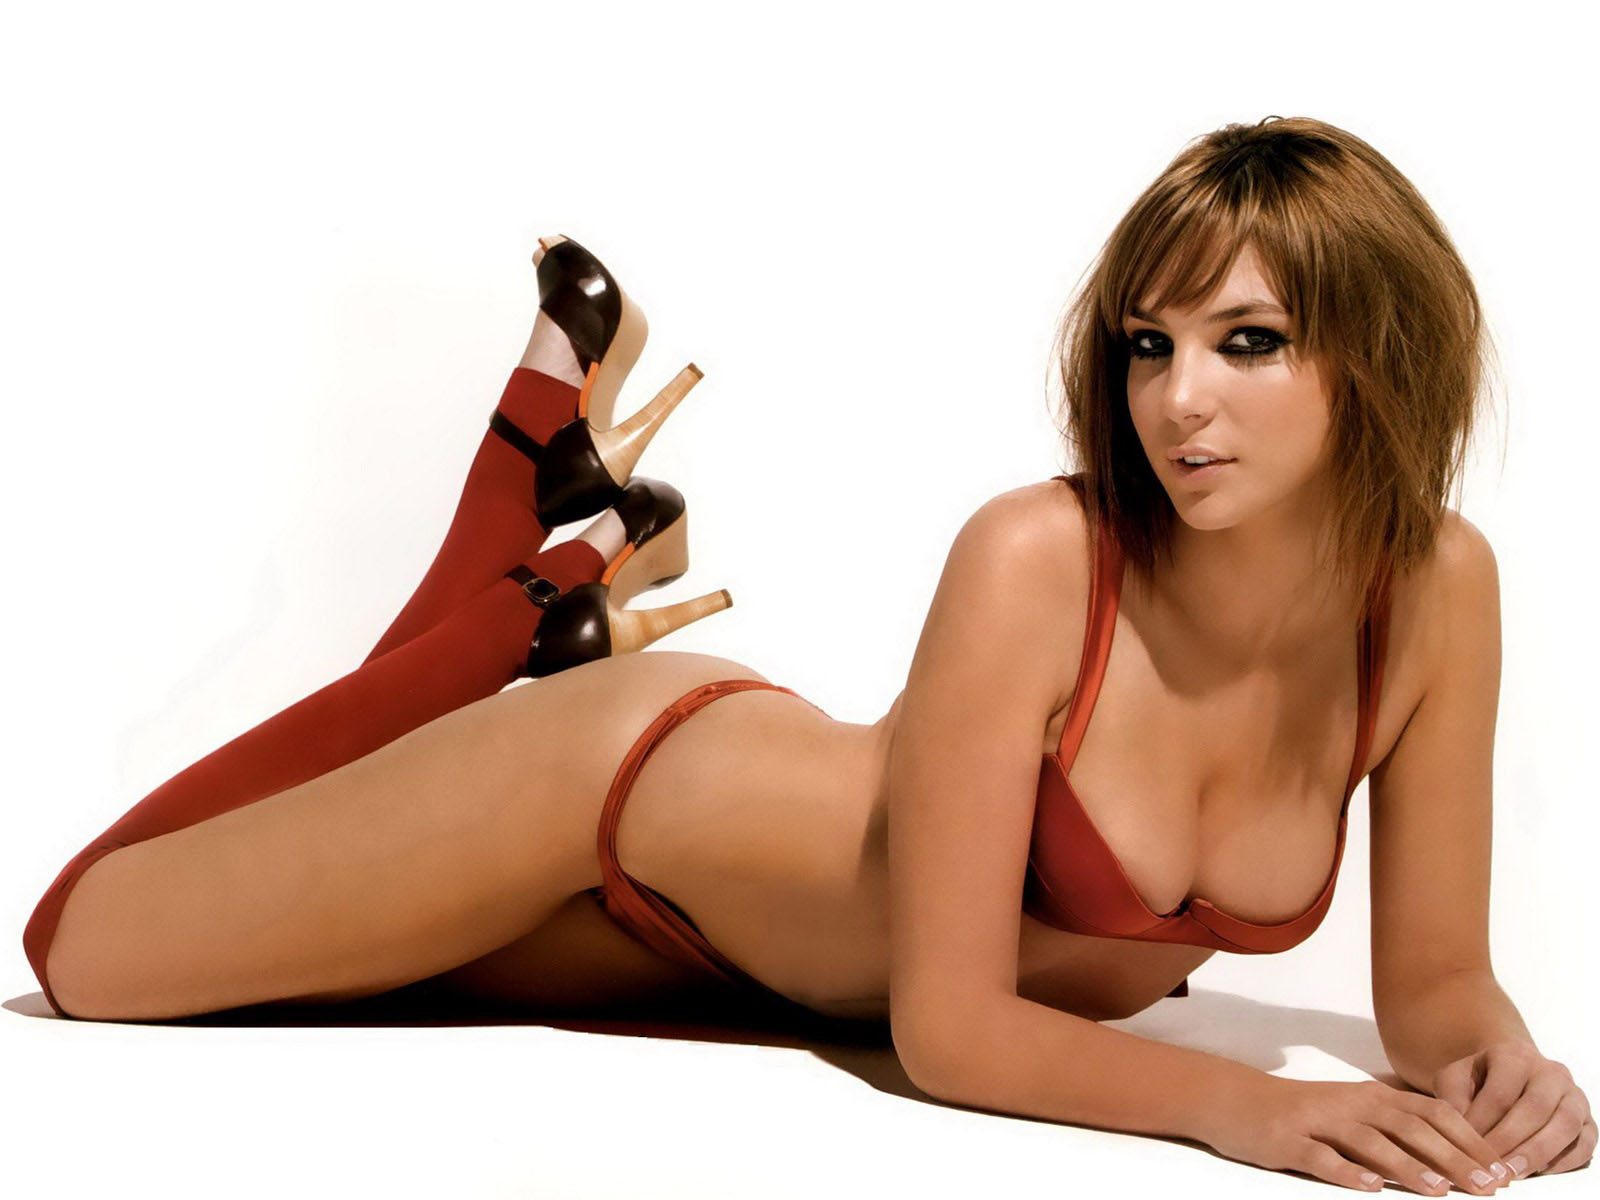 hd super sexy girls - photo #5